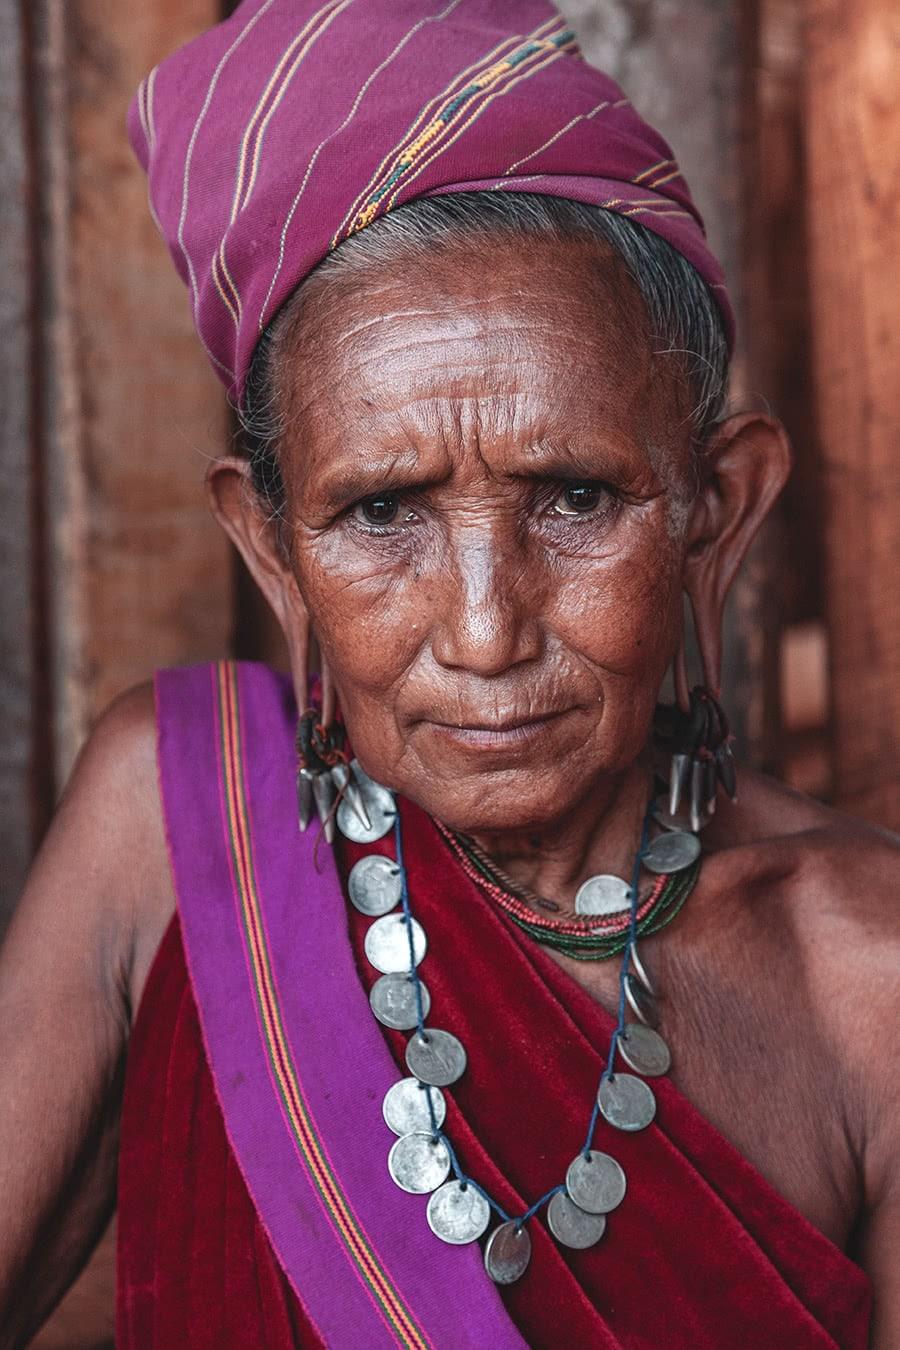 A woman from the Kayah tribe, at Dawdama Gyi village, Myanmar.